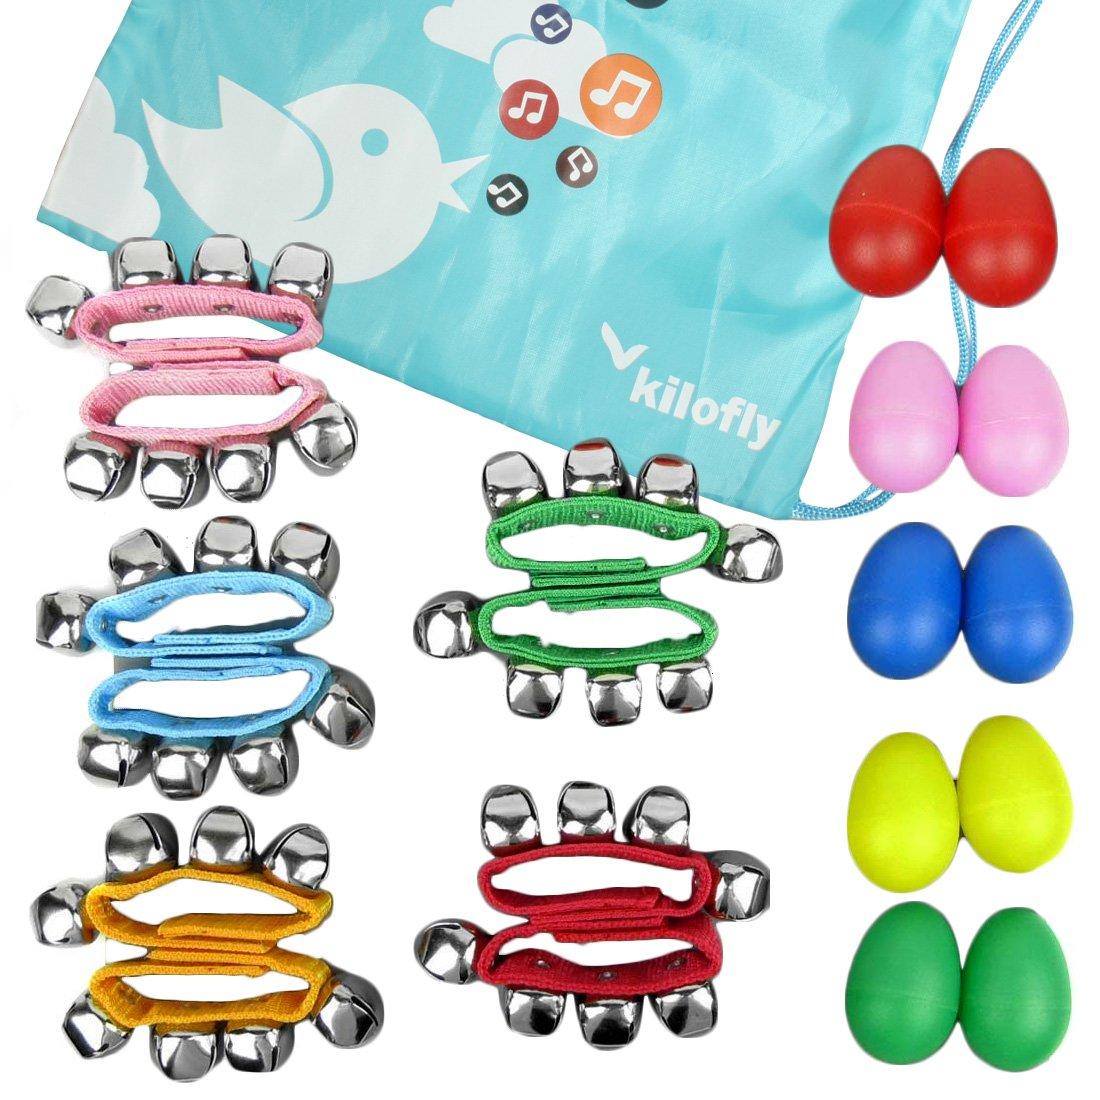 Amazon.com : kilofly Musical Instruments Rhythm Toys Value Pack 10 ...